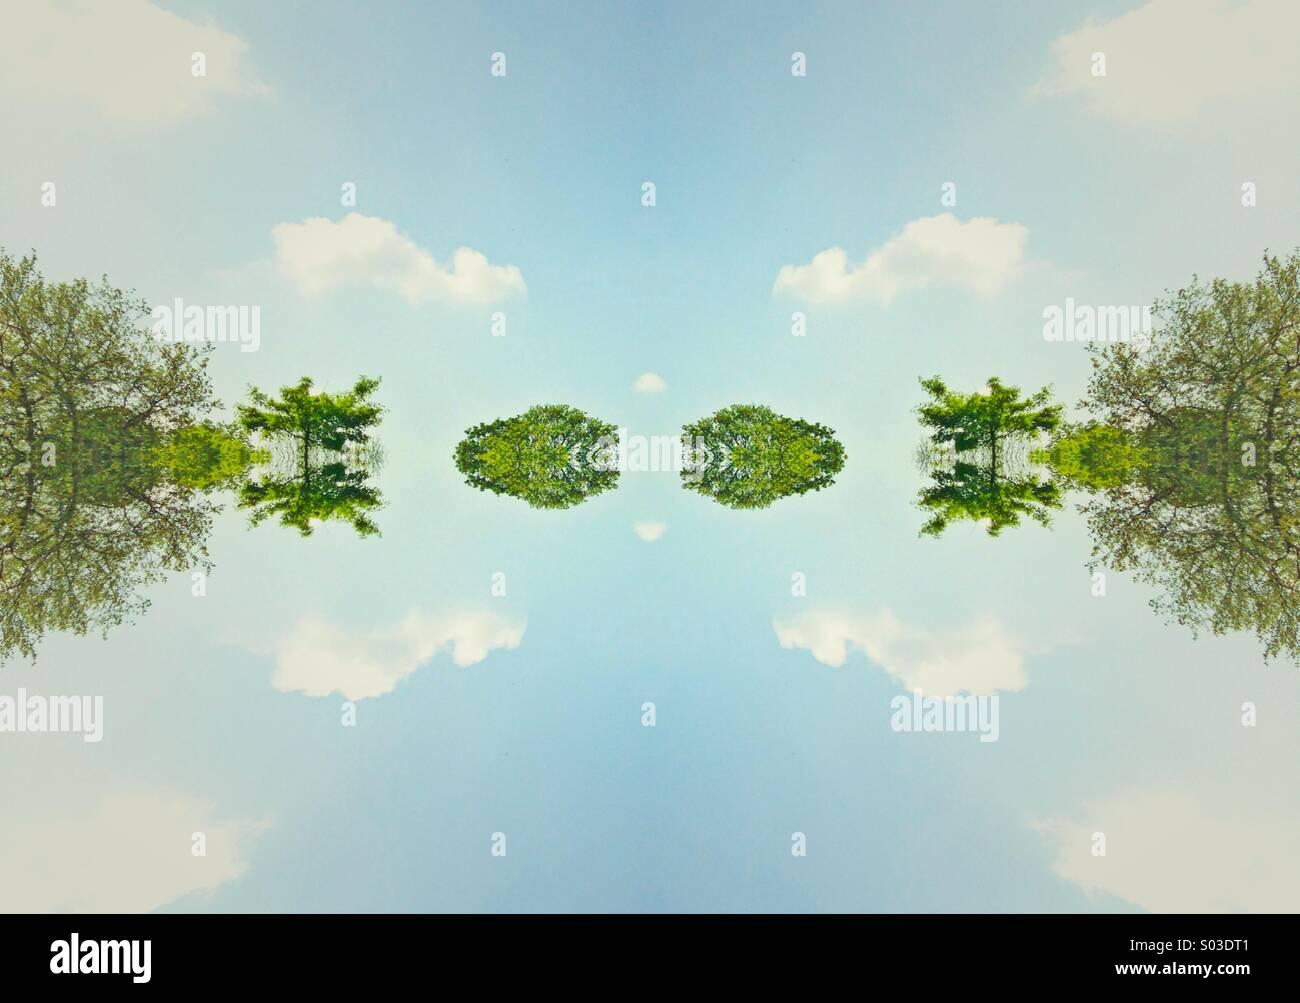 Surreal photograph - Stock Image